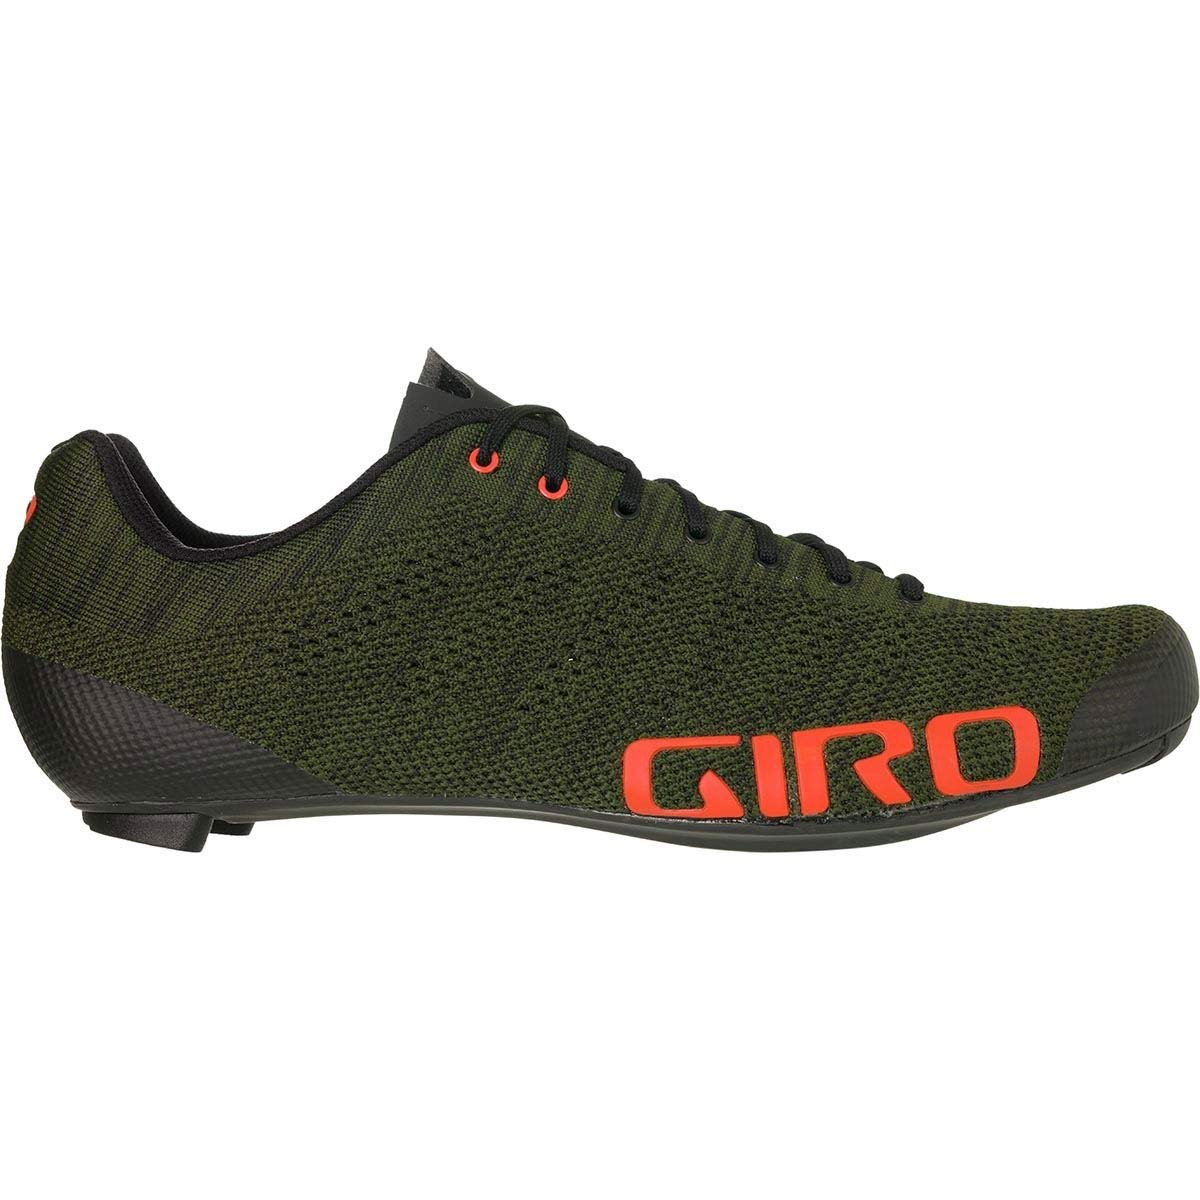 Giro レディース US サイズ: 46 M EU カラー: グリーン   B07J2SCX3Y